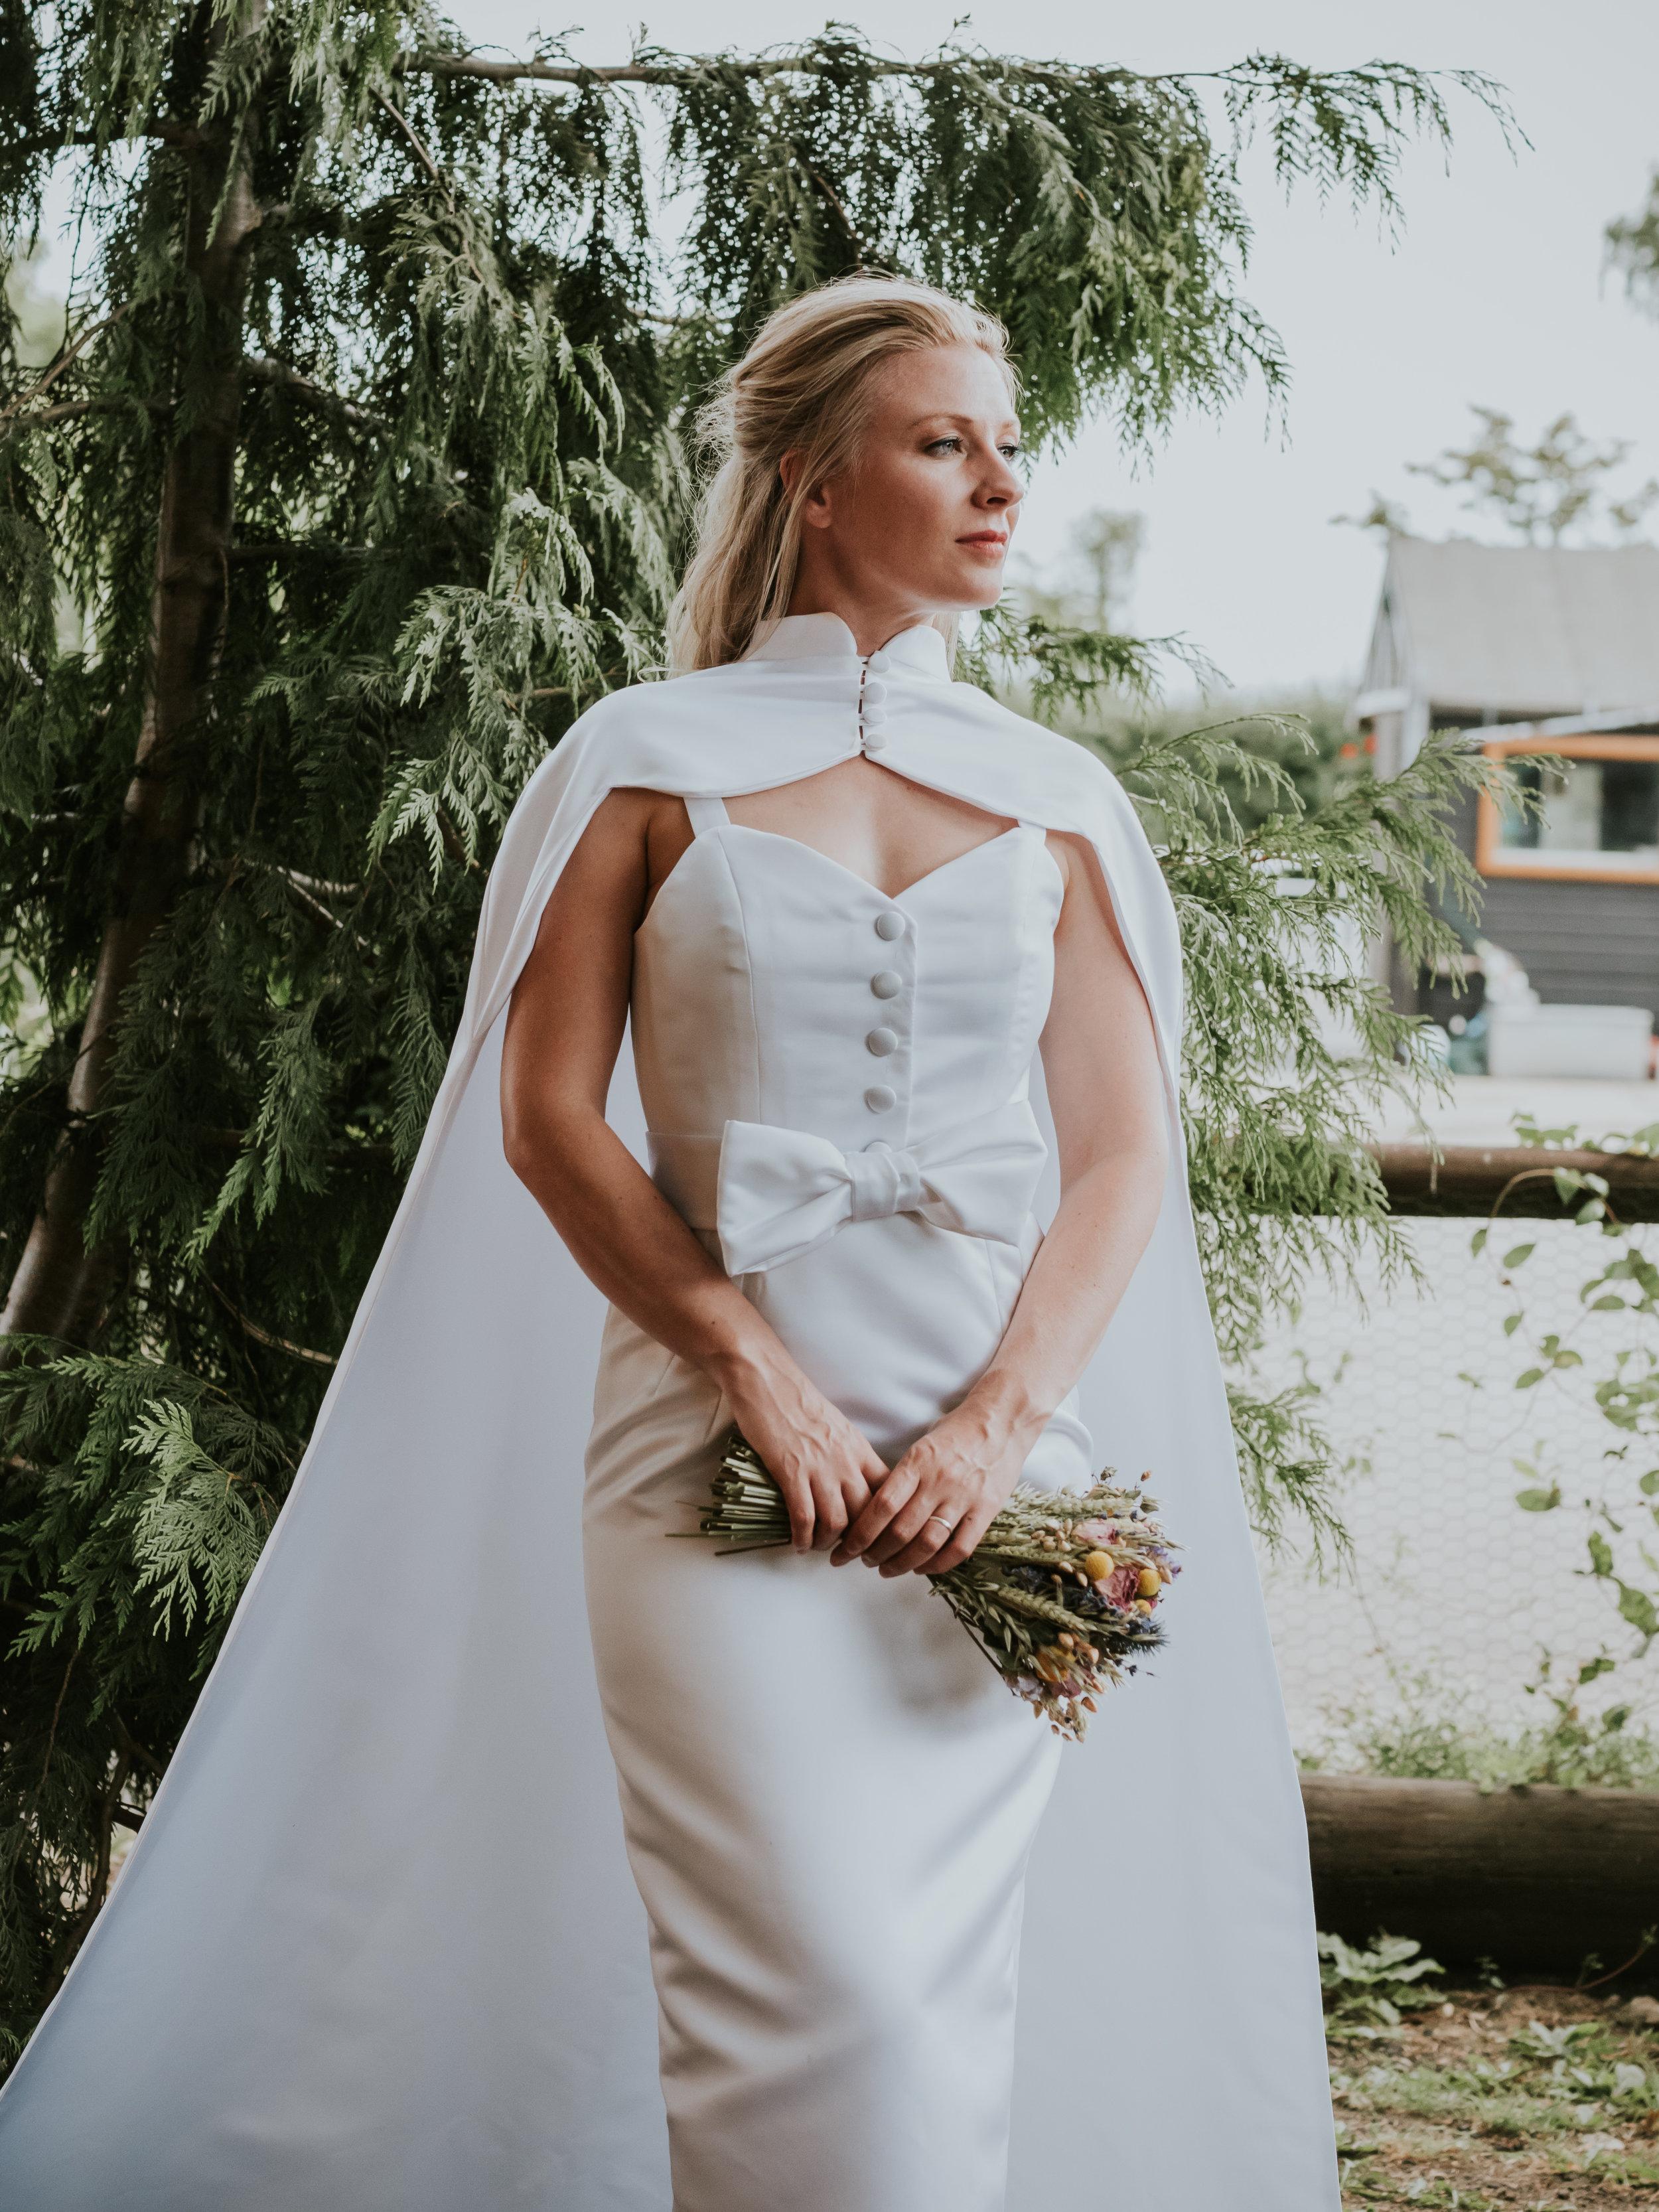 Jessica-Milberg-Photography-Brighton-London-Wedding-Fashion-Photographer-Creative-Wedding-Dress-114.jpg